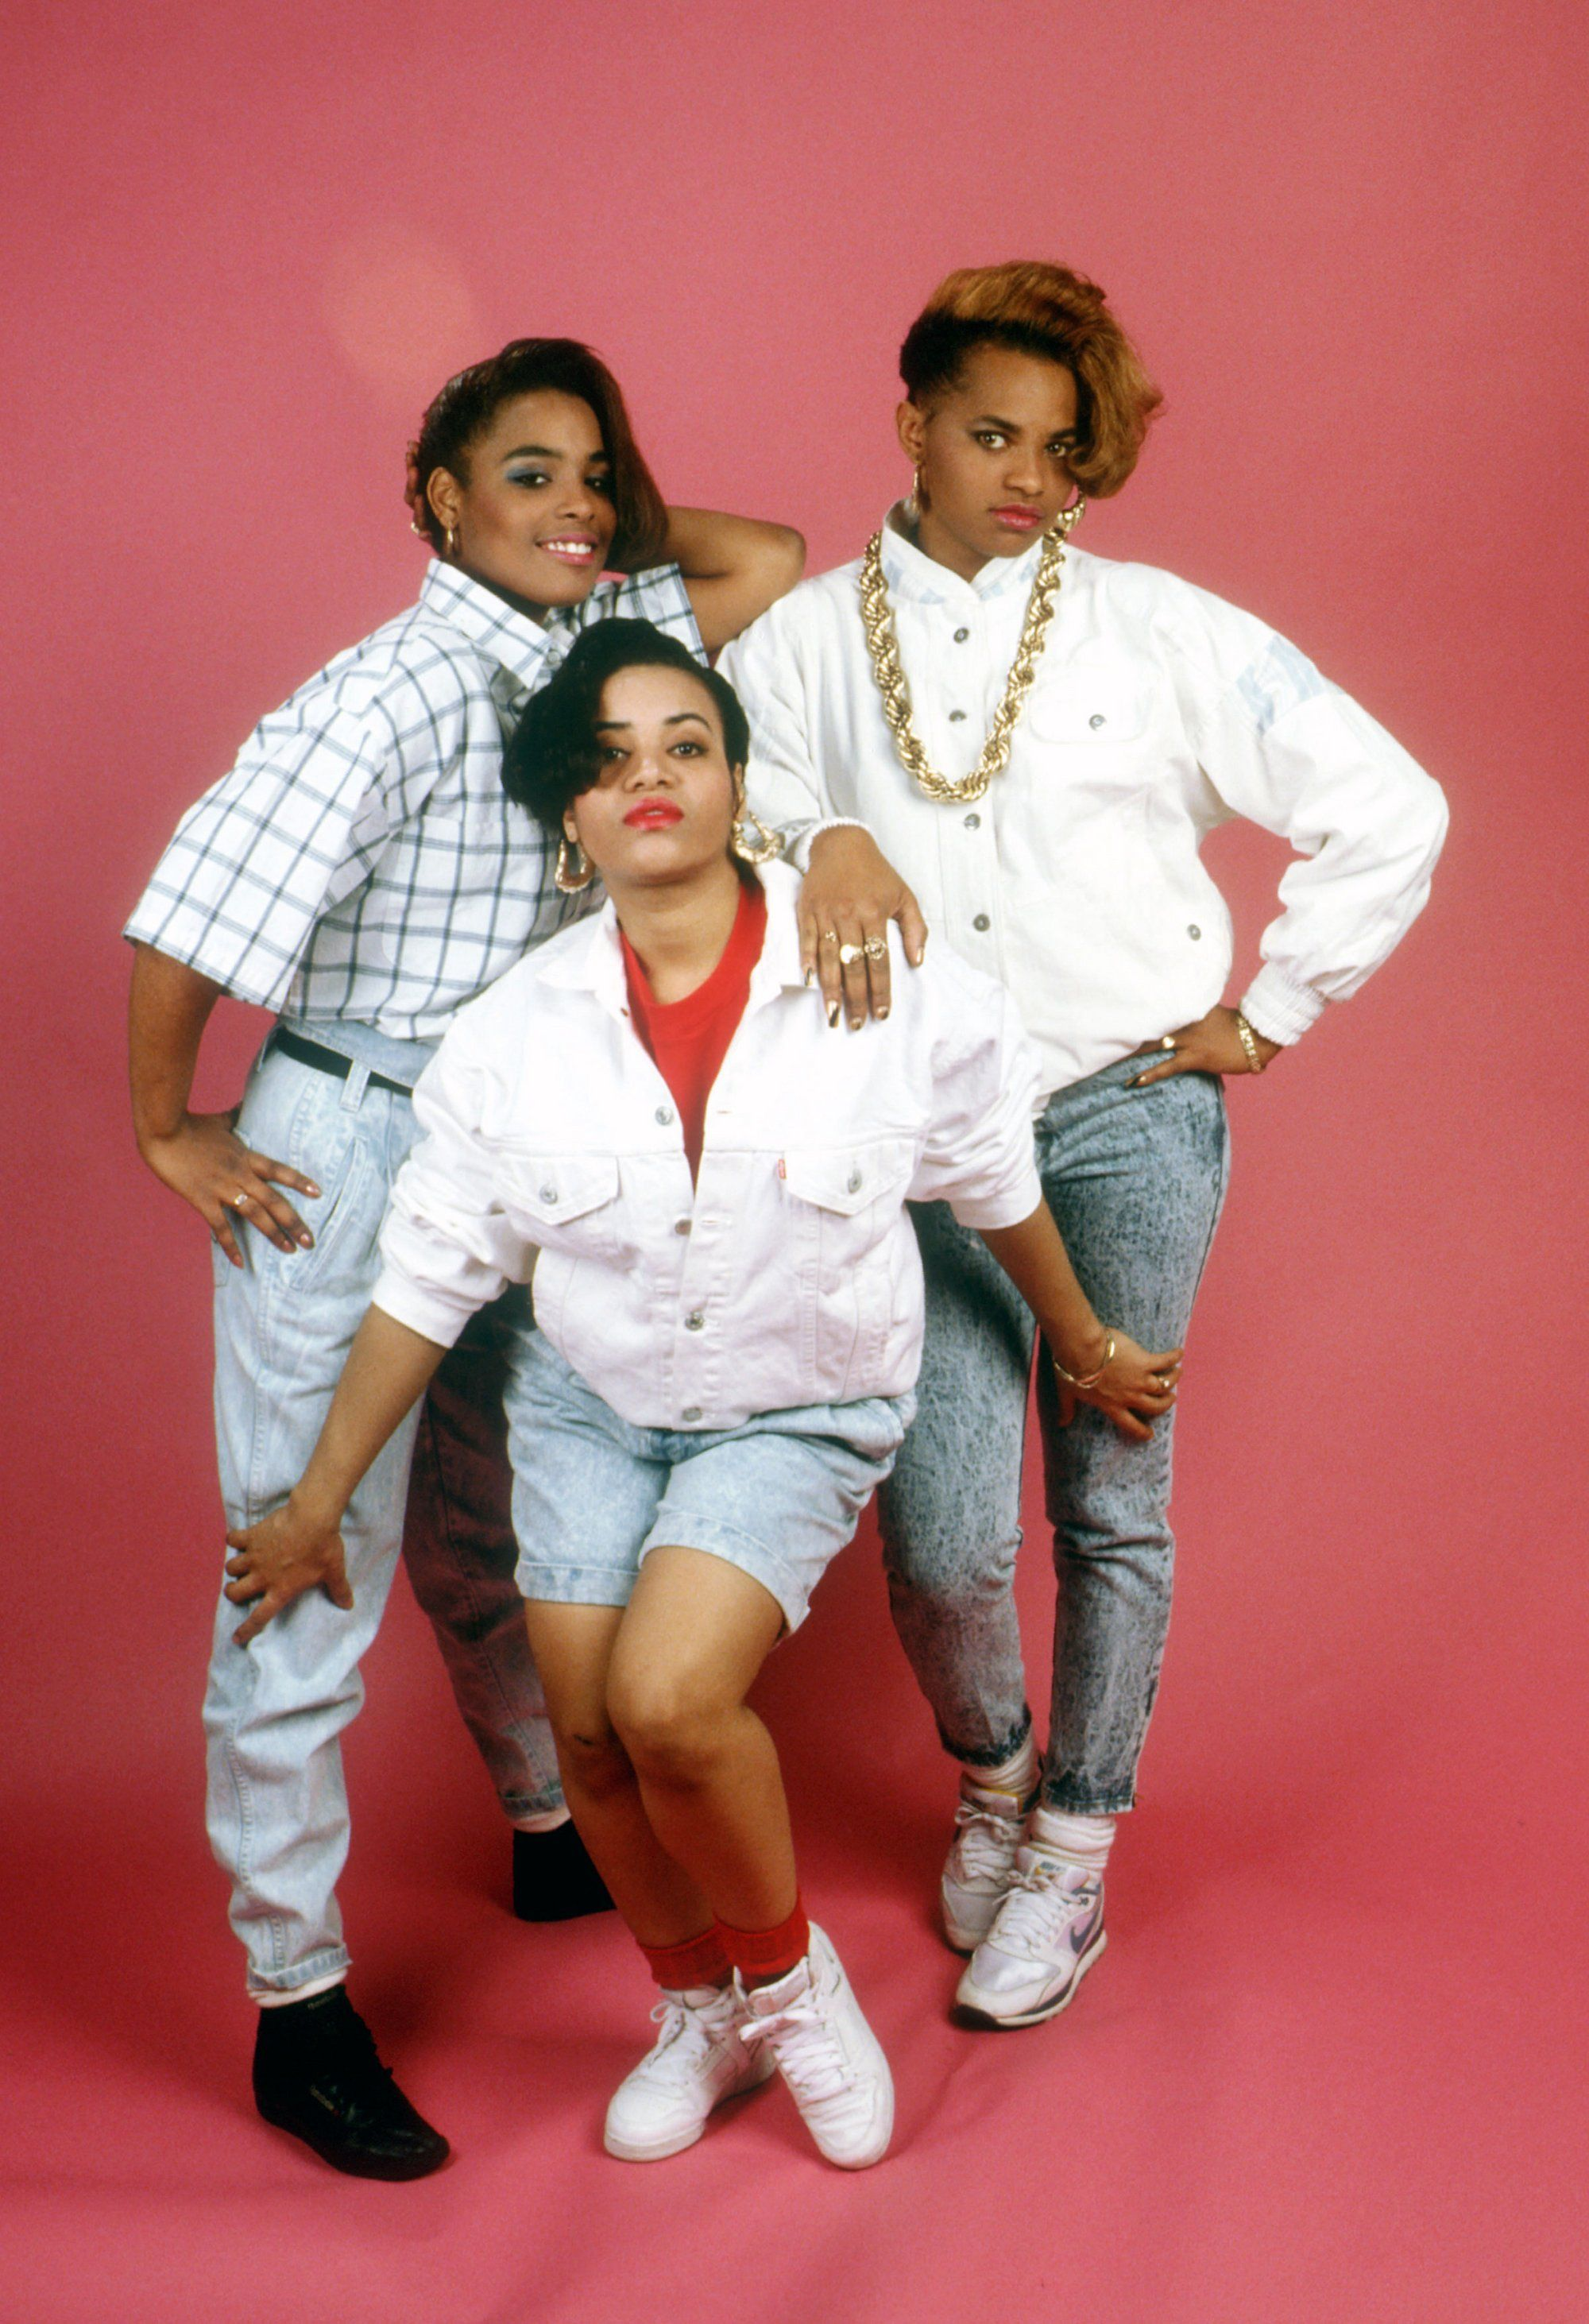 From Lil' Kim to Missy Elliott, the '90s Hip-Hop Stars ...